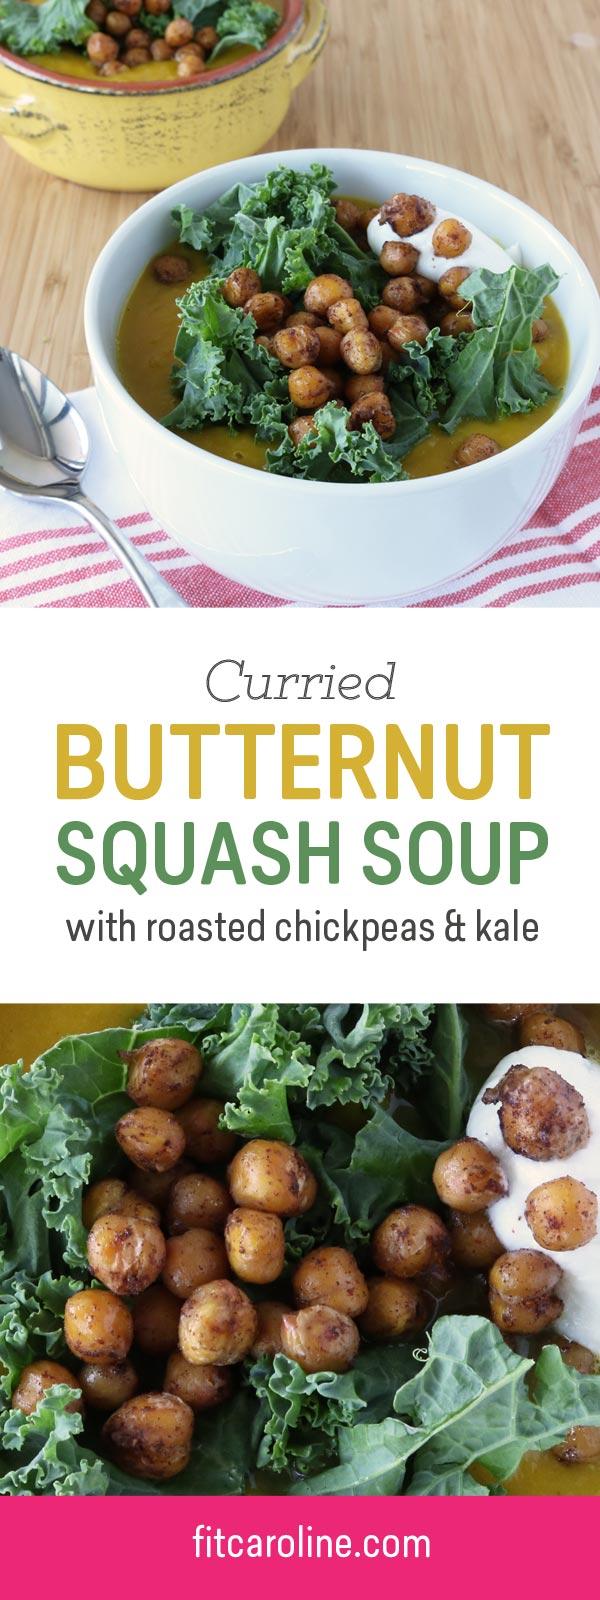 fitcaroline_butternut_squash_soup_blog